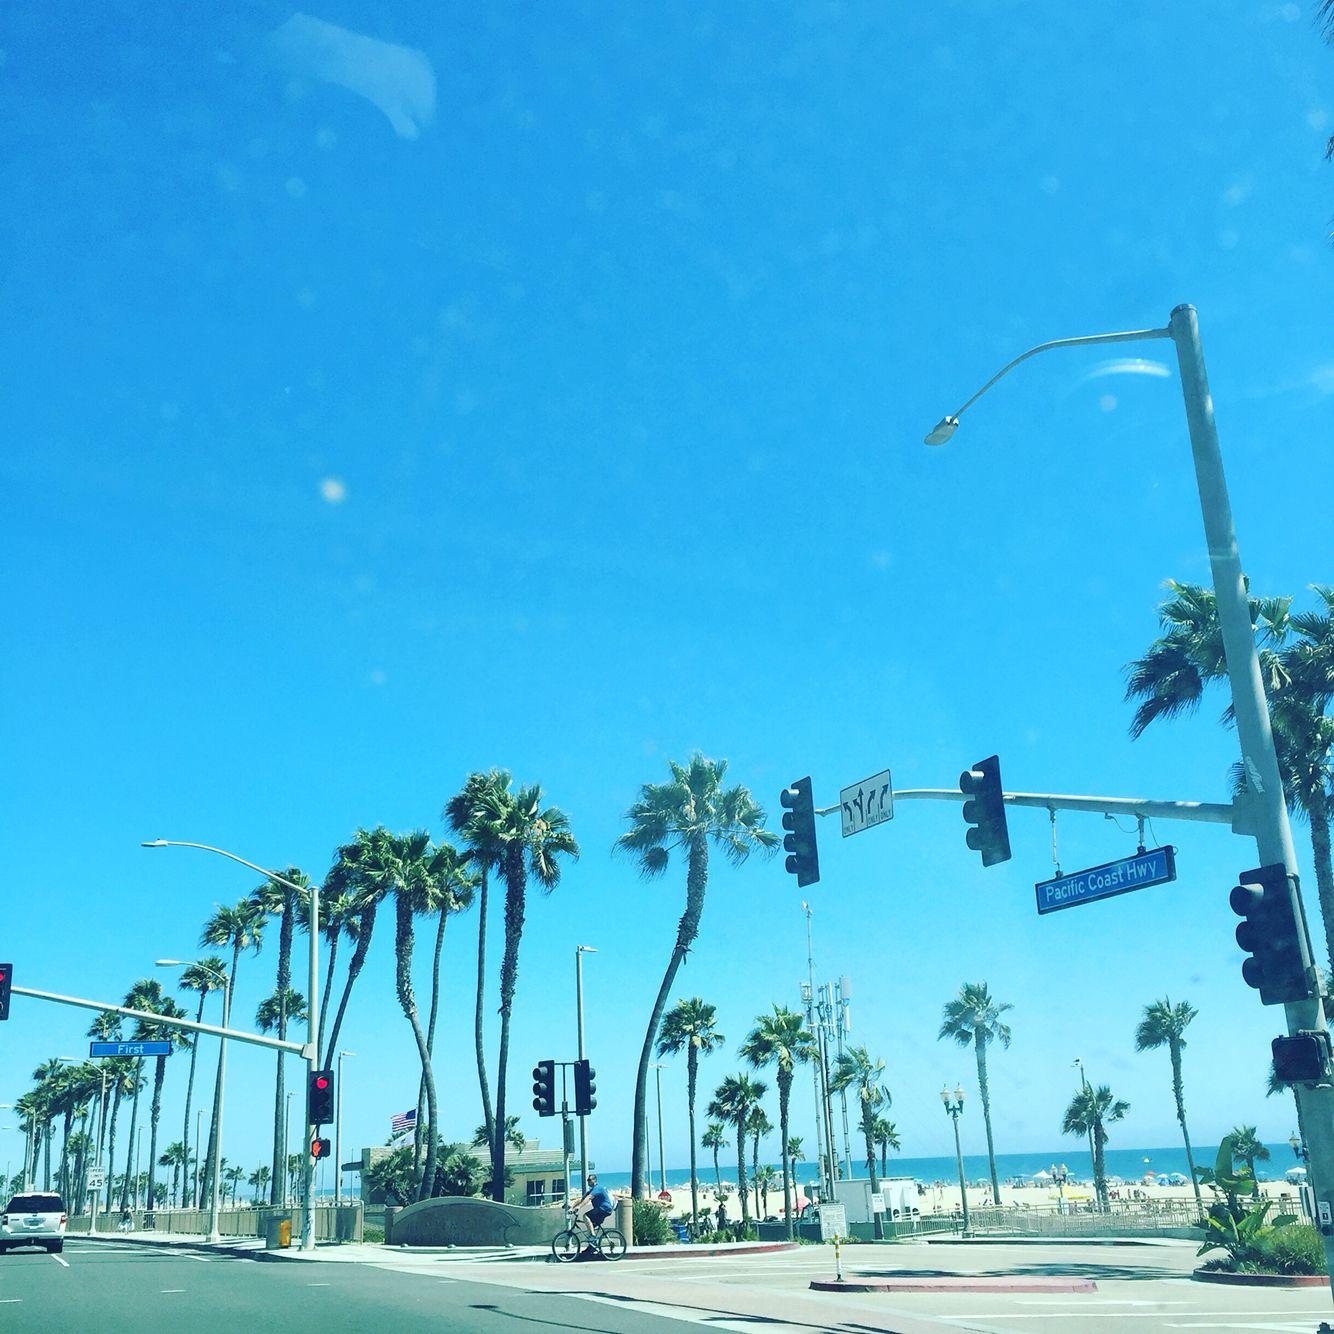 Huntington beach huntington beach beach california